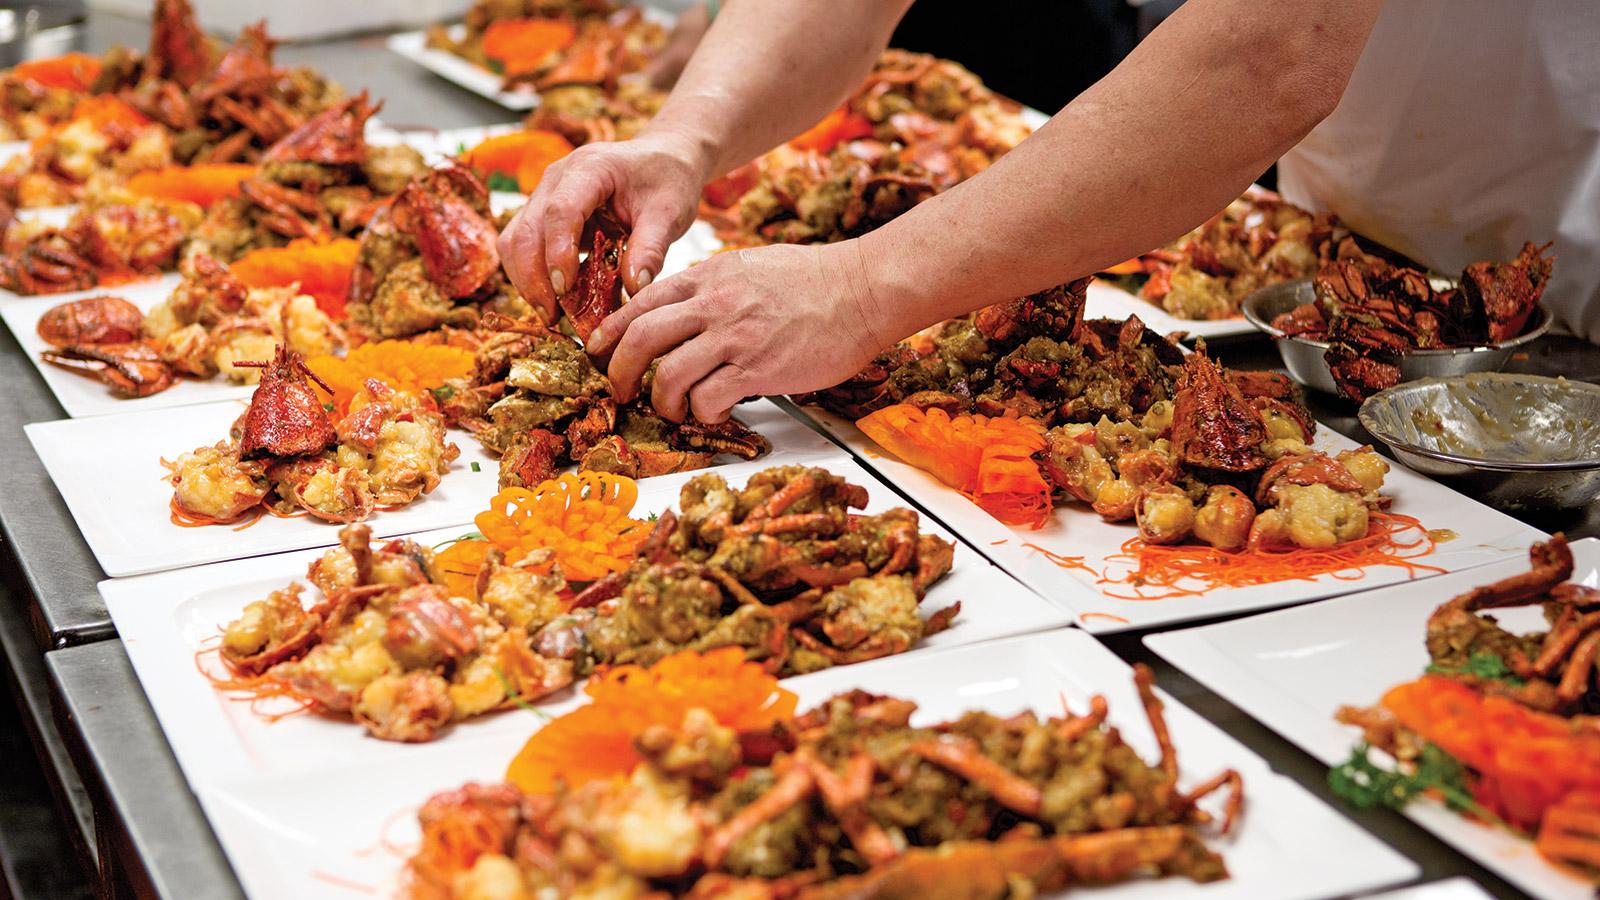 Блюда в пекинском ресторане Dao. Вместо тысячи слов. Фото: macleans.ca